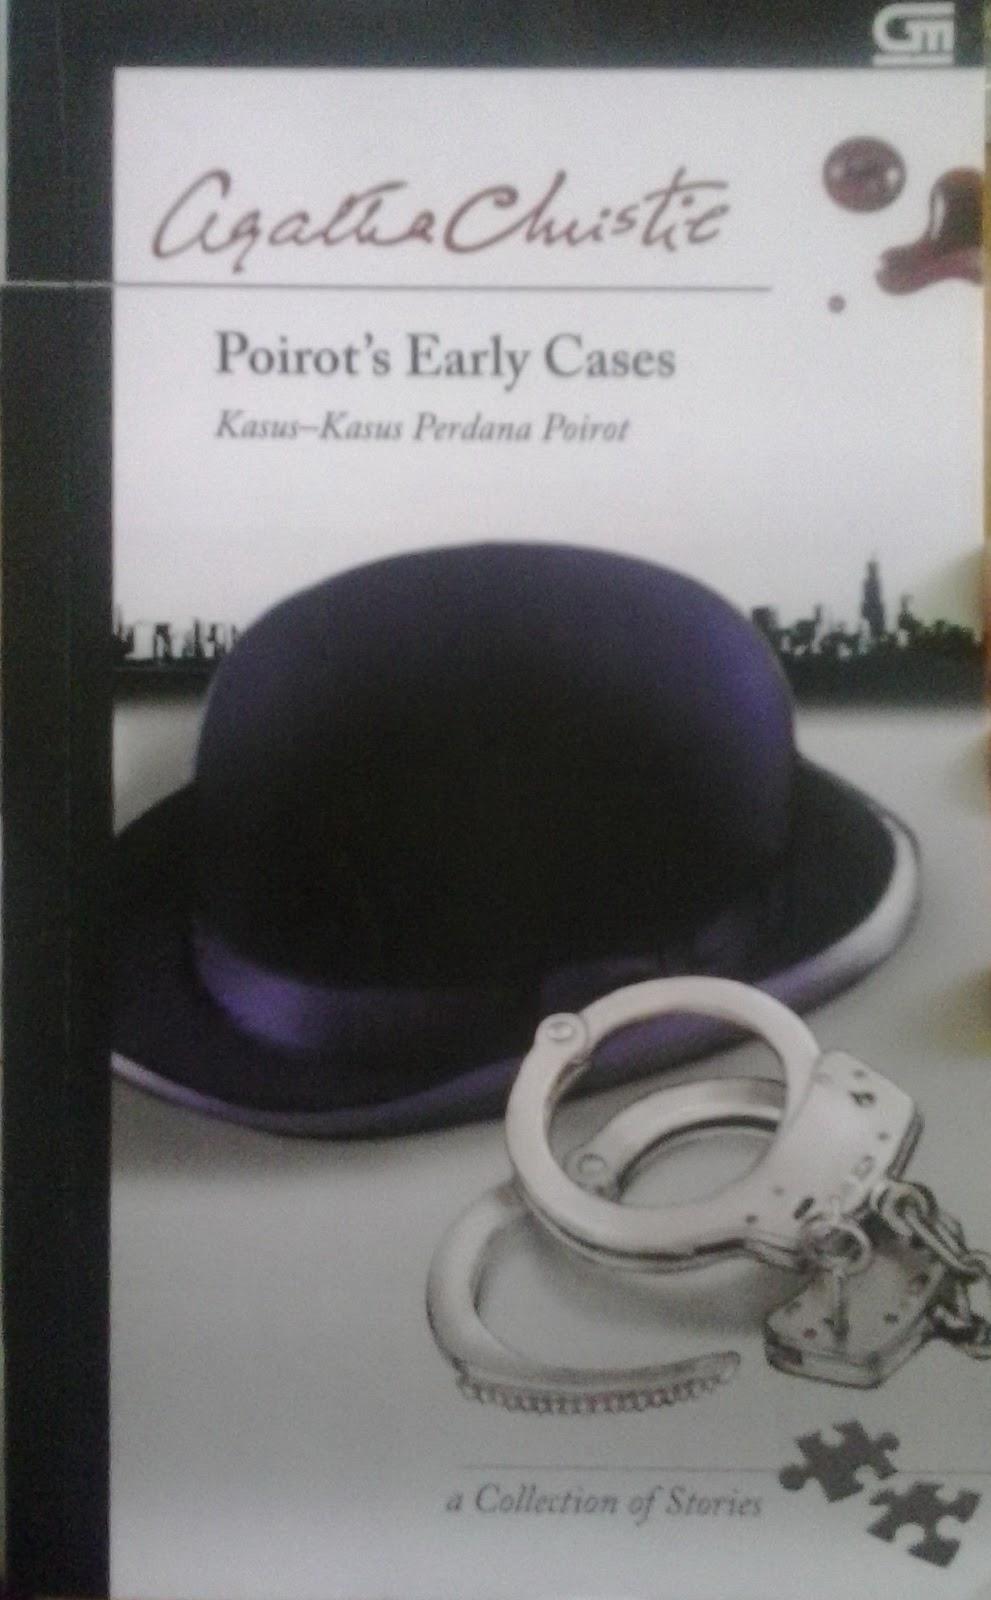 Agatha Christie - Kasus-Kasus Perdana Poirot